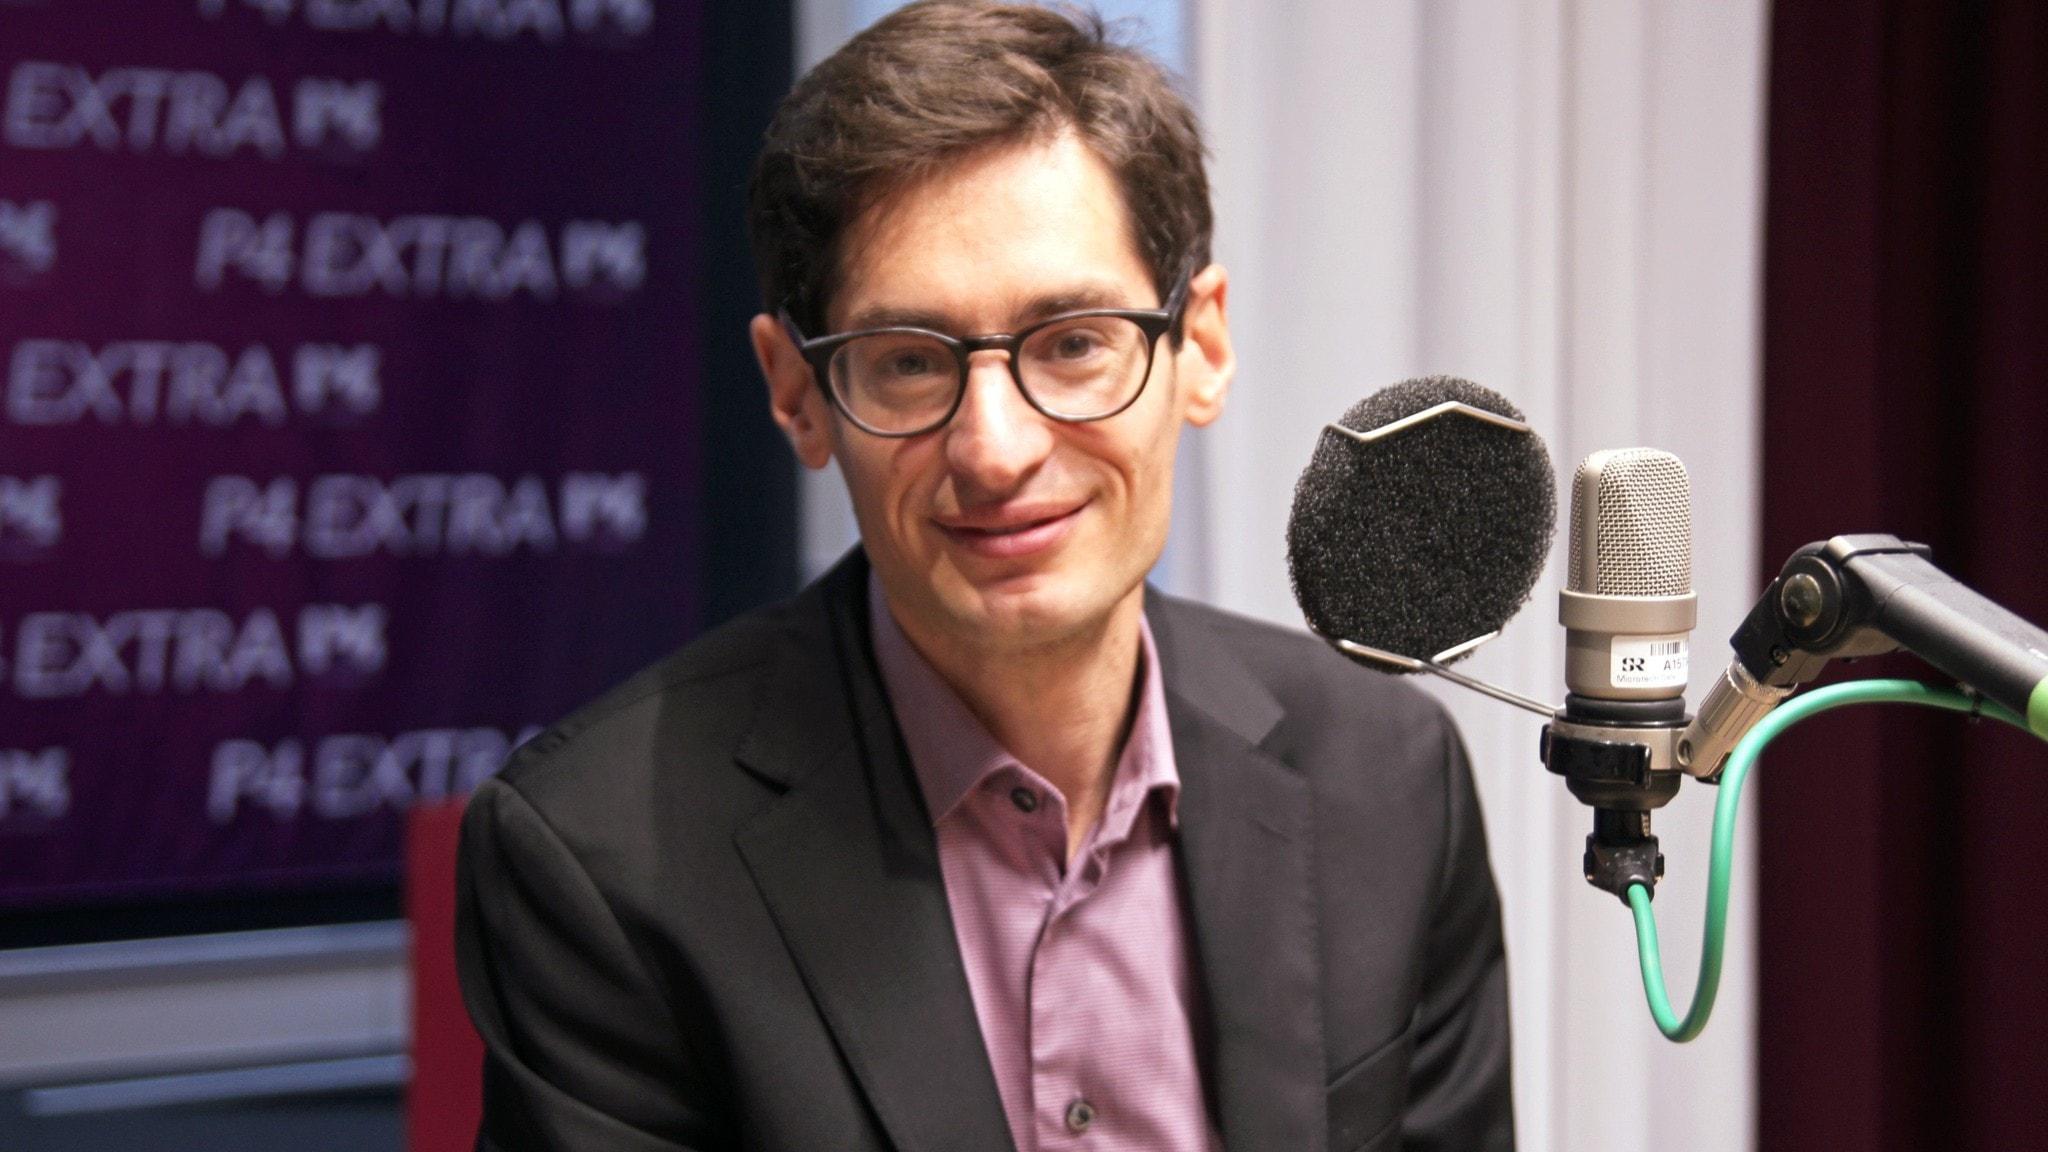 Peter Wolodarski om kritiserade corona-kolumnen: